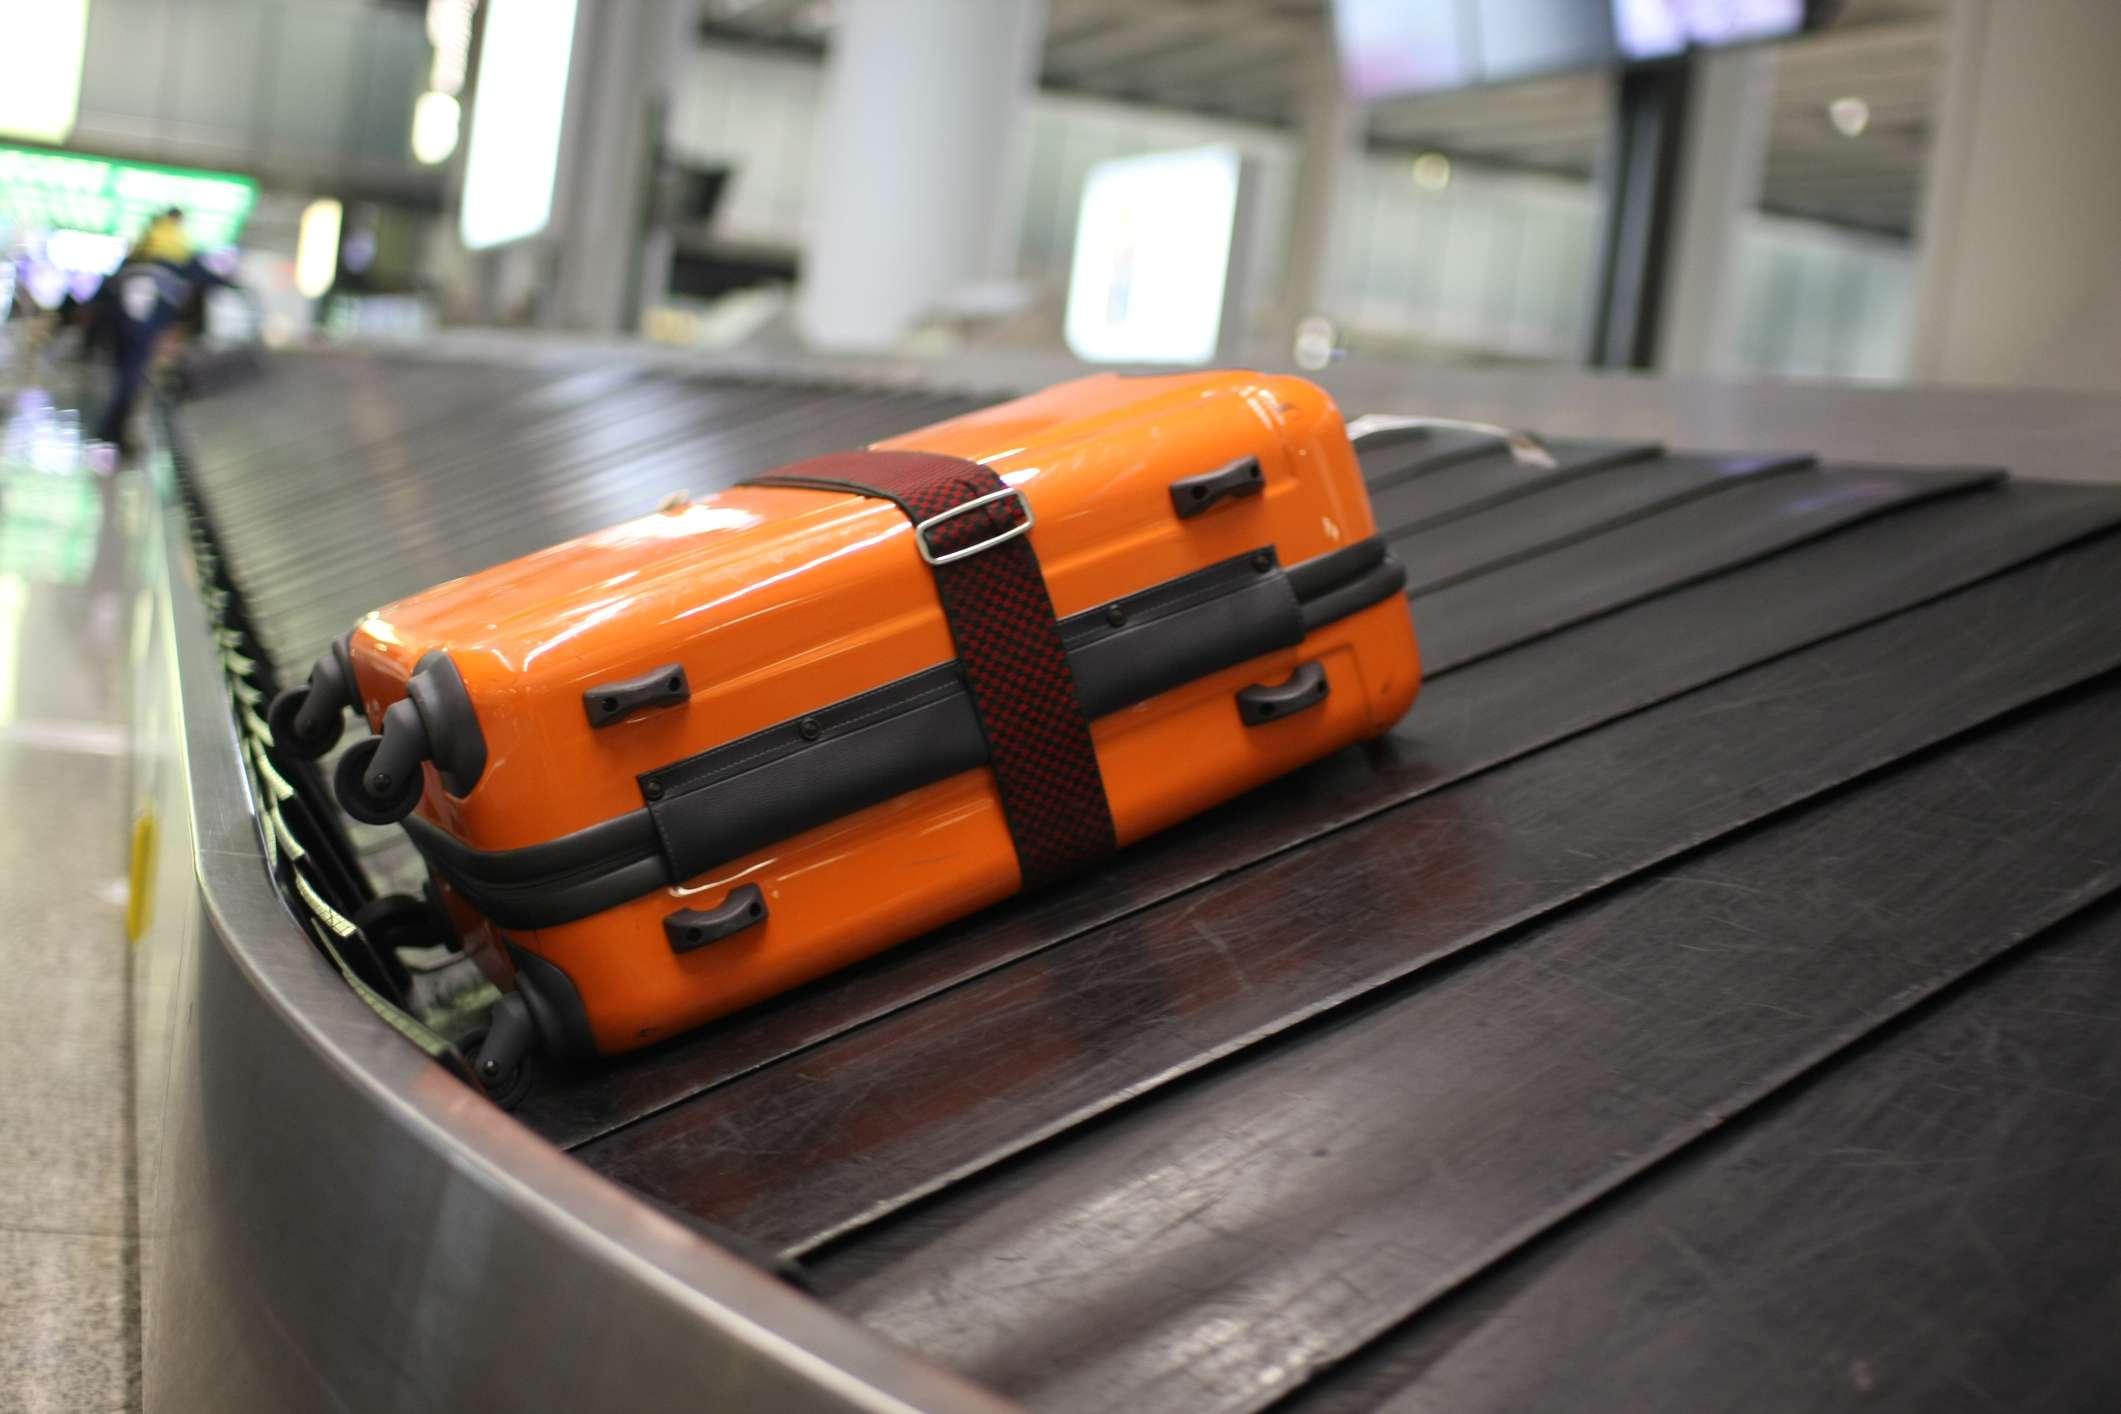 A piece of luggage on a baggage return belt